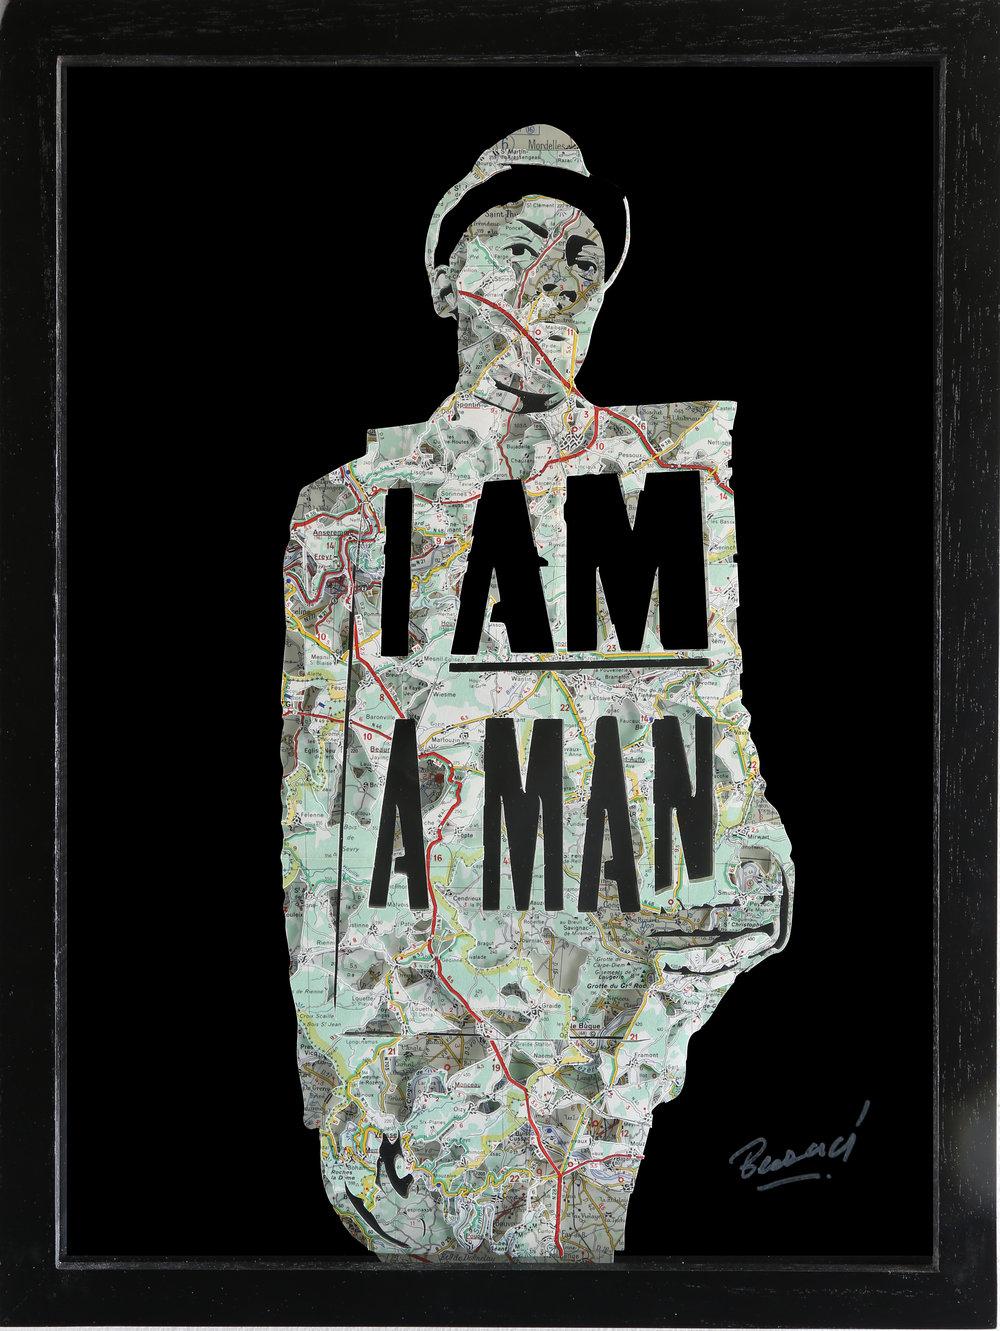 GalleryOonH-Joanathan Bessaci-I Am A Man-2017-Michelin maps and glass-16x12-1100.JPG